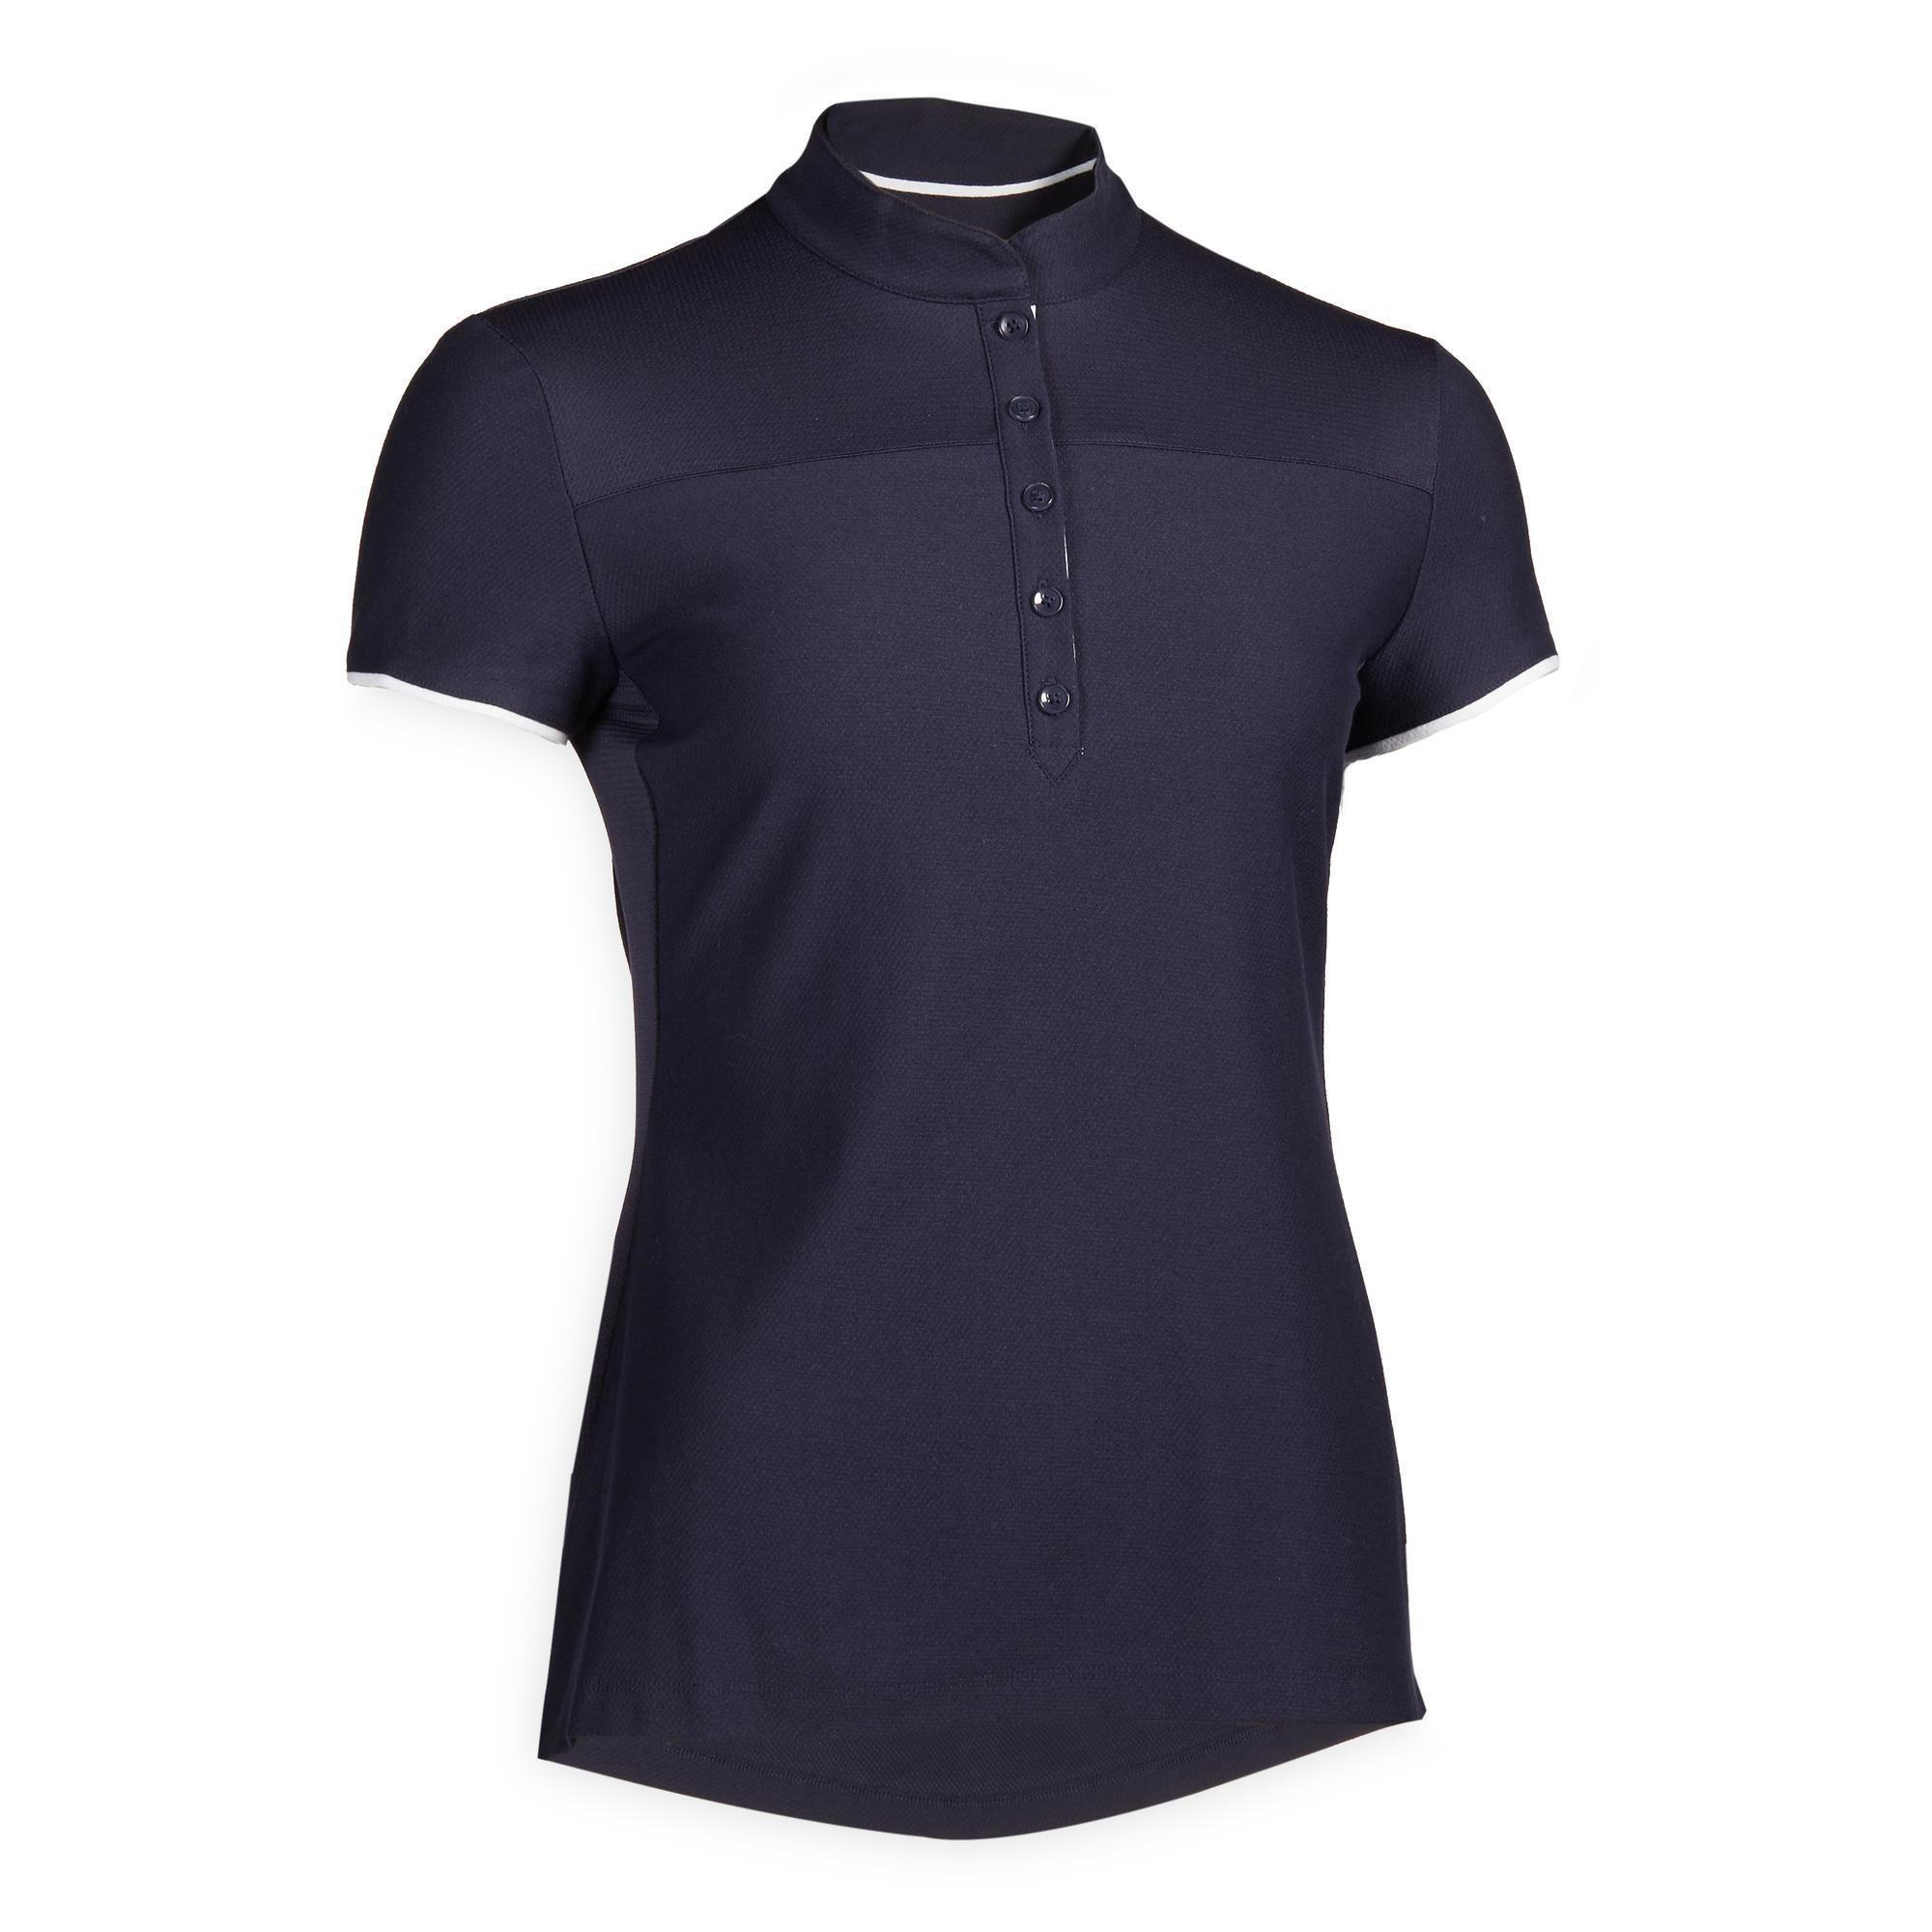 Reit-Poloshirt kurzarm 500 Damen marineblau